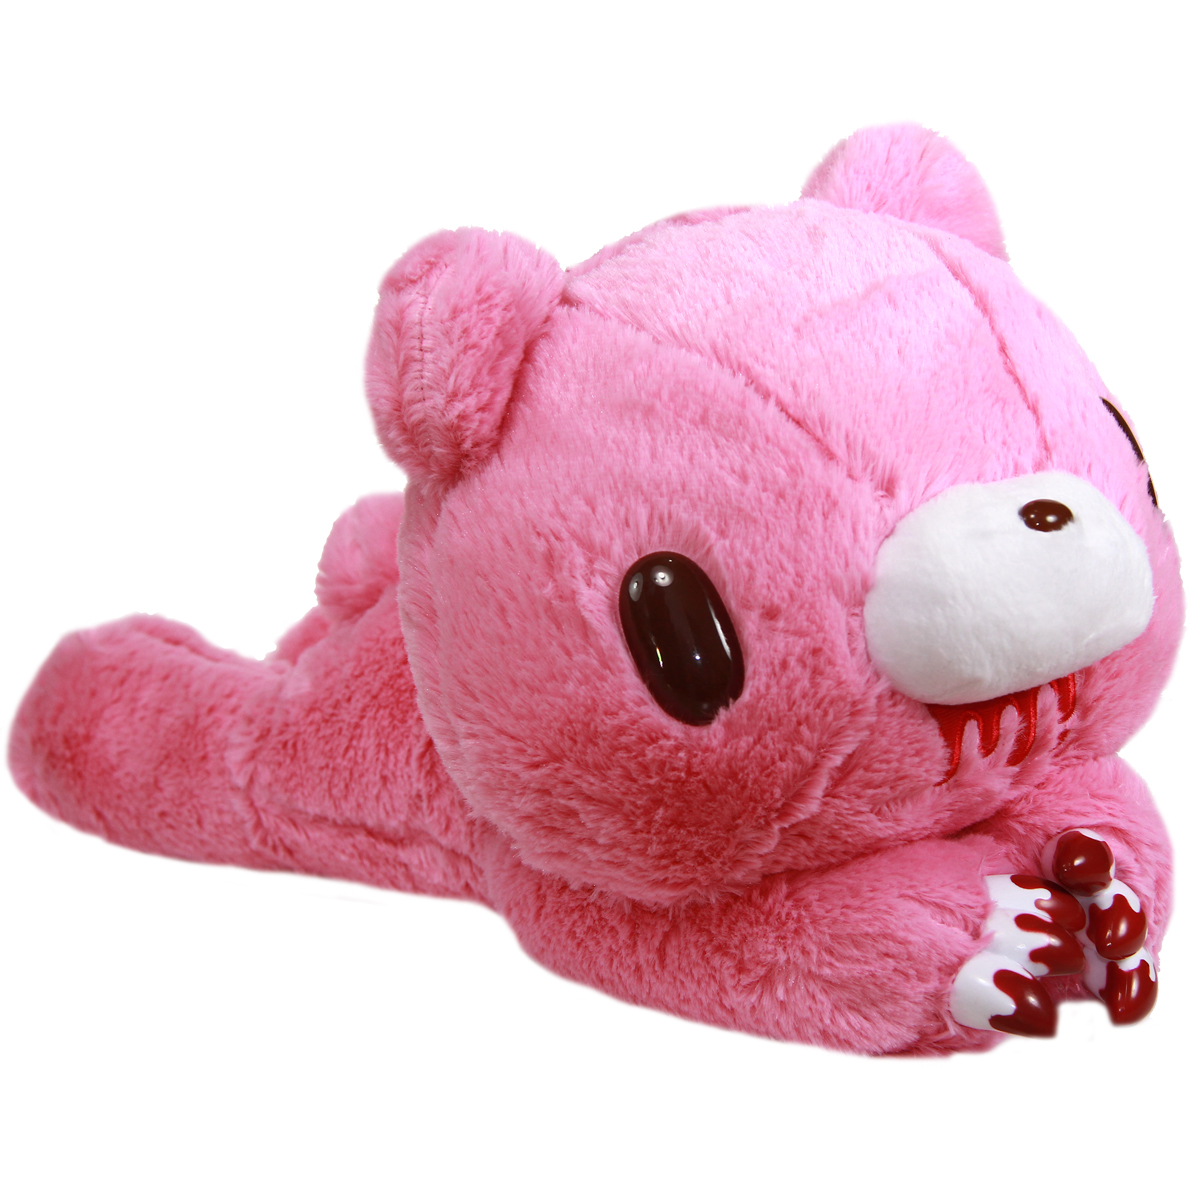 Gloomy Bear Plush Doll Laying Down GP #546 Pink 16 Inches Taito